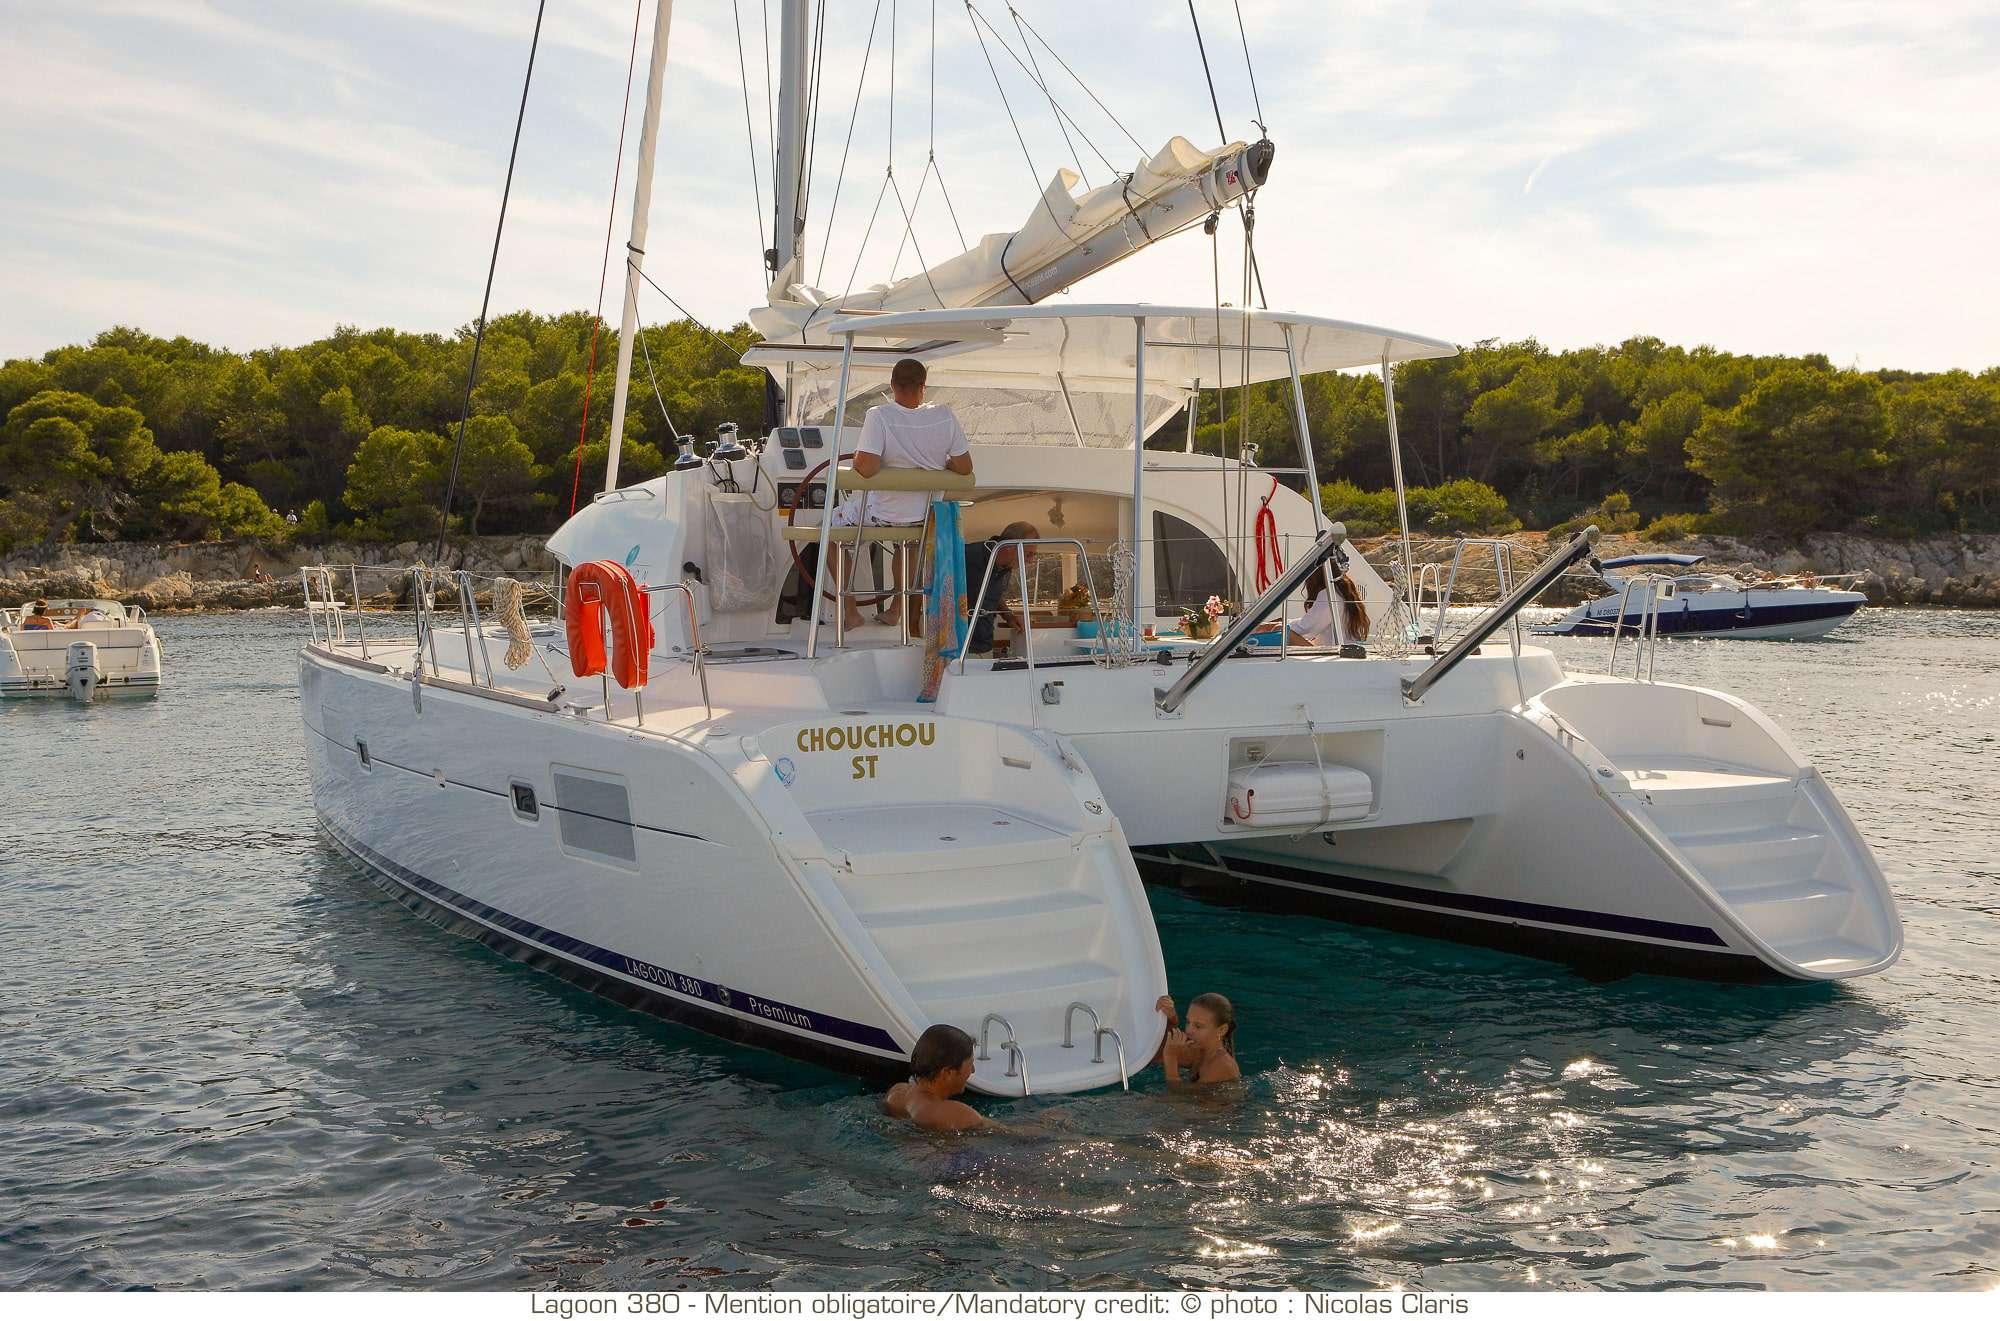 lagoon 380-yacht-charter-croatia-sailing-holidays-croatia-booking-yacht-charter-croatia-catamarans-sailboats-motorboats-gulets-luxury-yachts-boat-rental-croatia 12